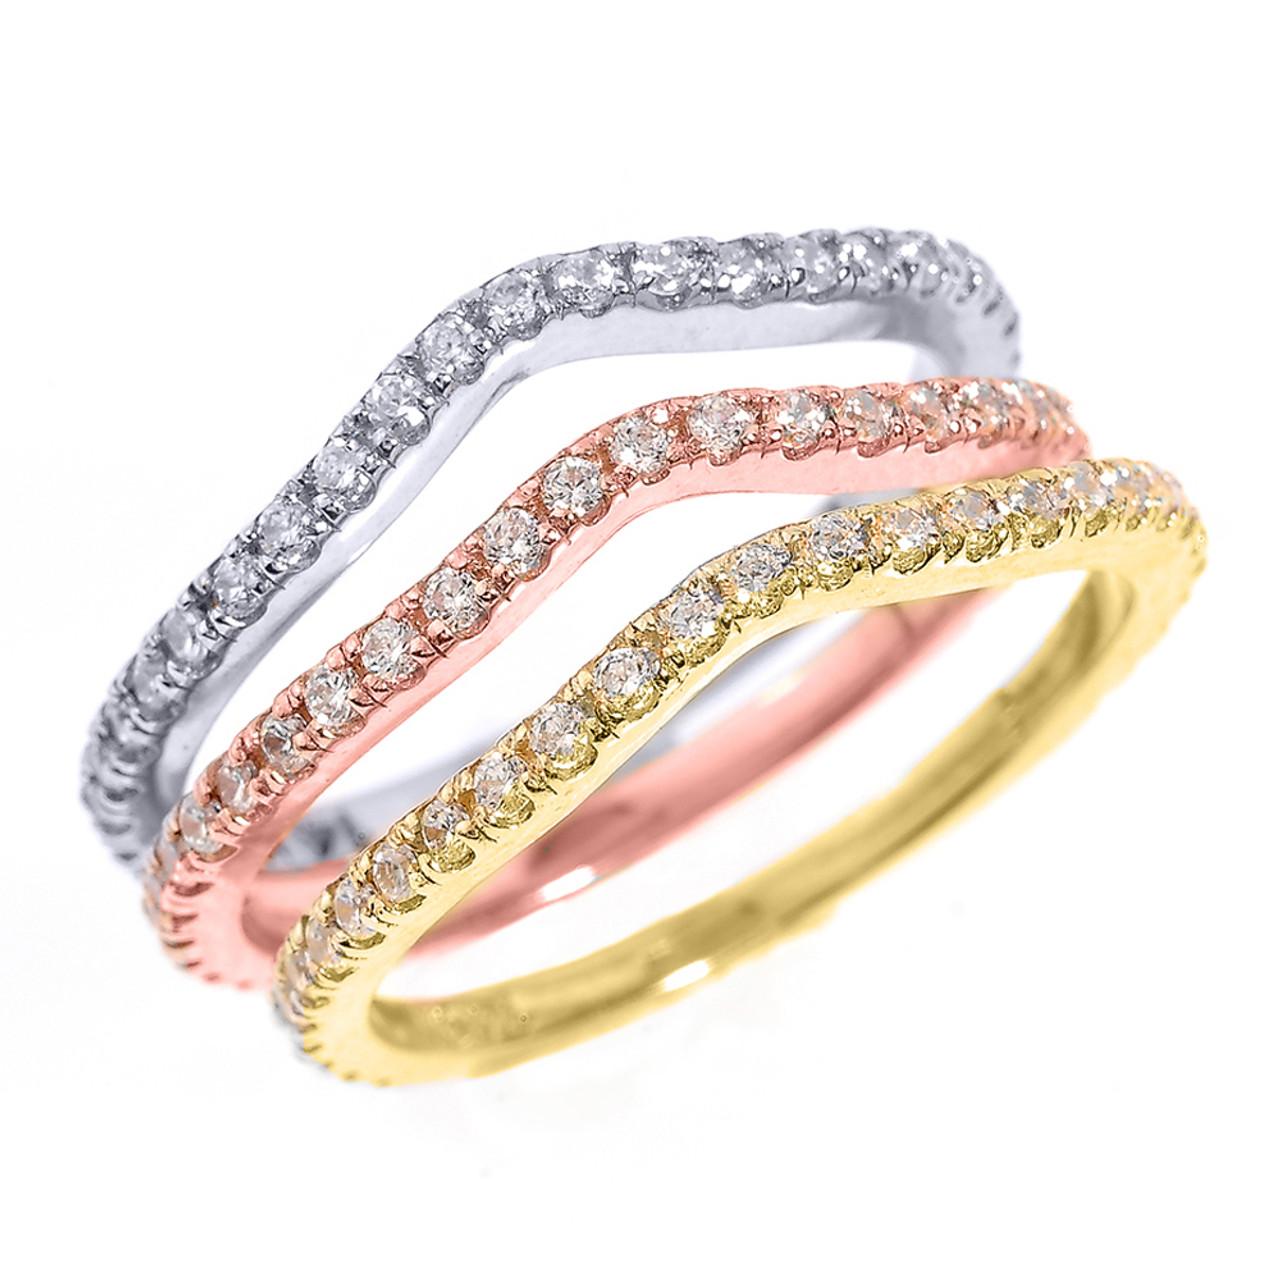 14k Tri Color Gold Chevron Diamond Stackable 3 Piece Wedding Ring Set